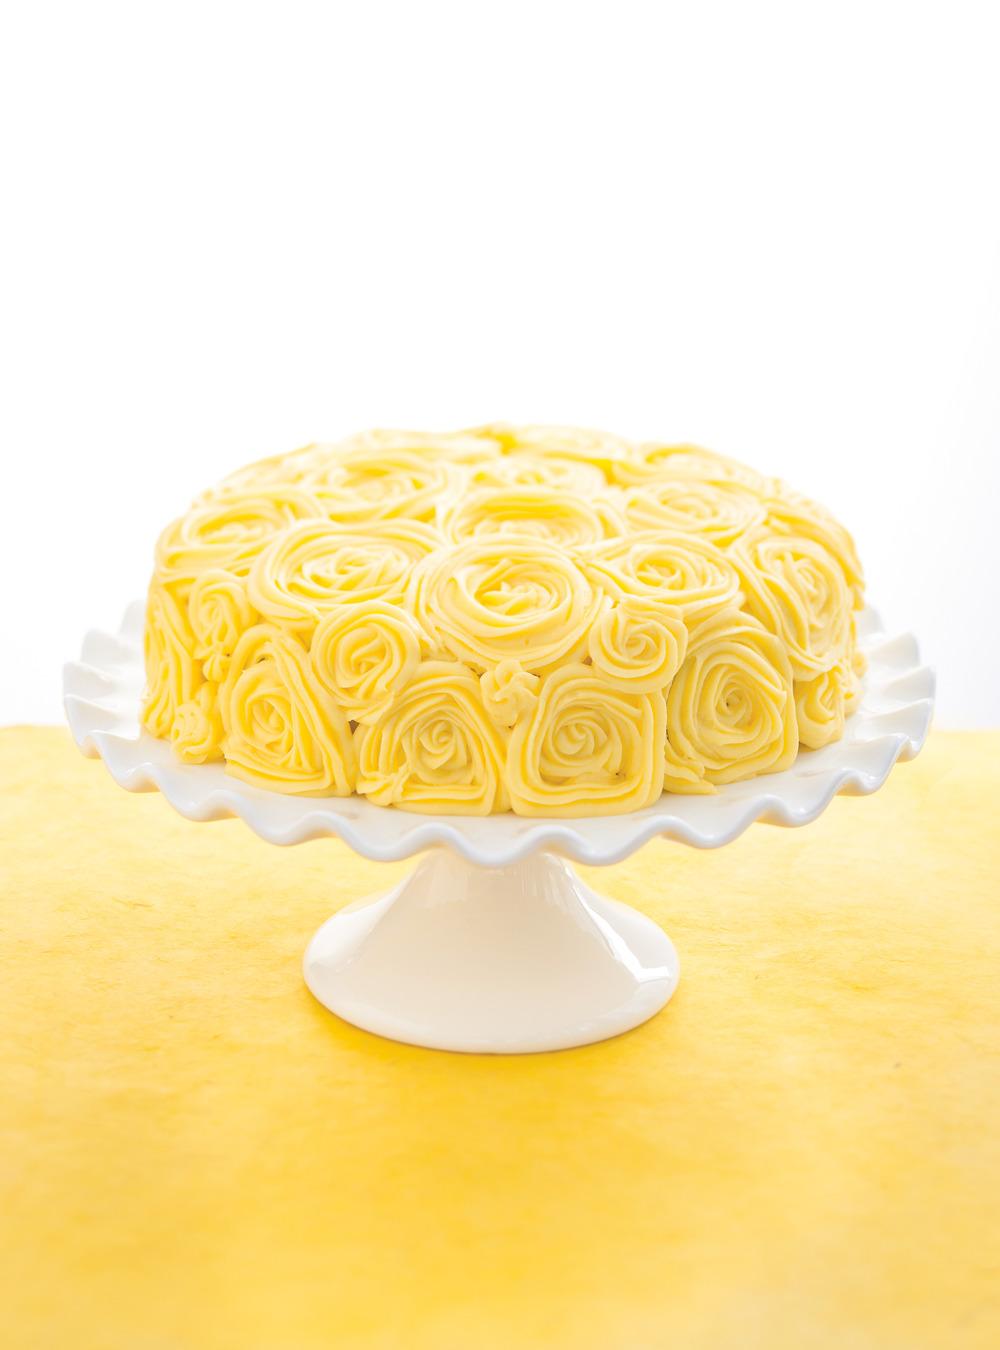 Gâteau à la vanille de base | ricardo